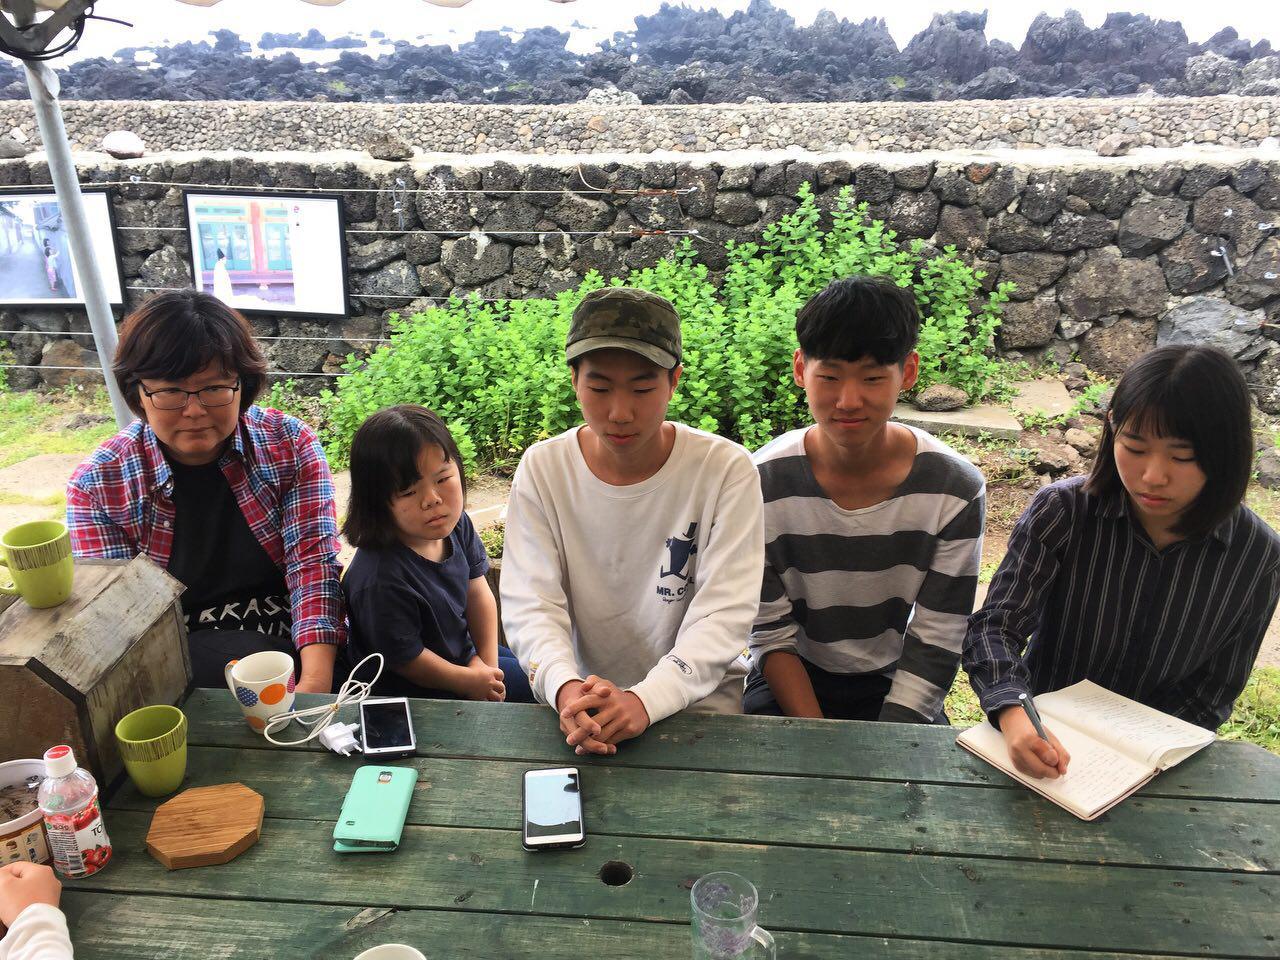 photo_2017-06-05_20-01-40.jpg